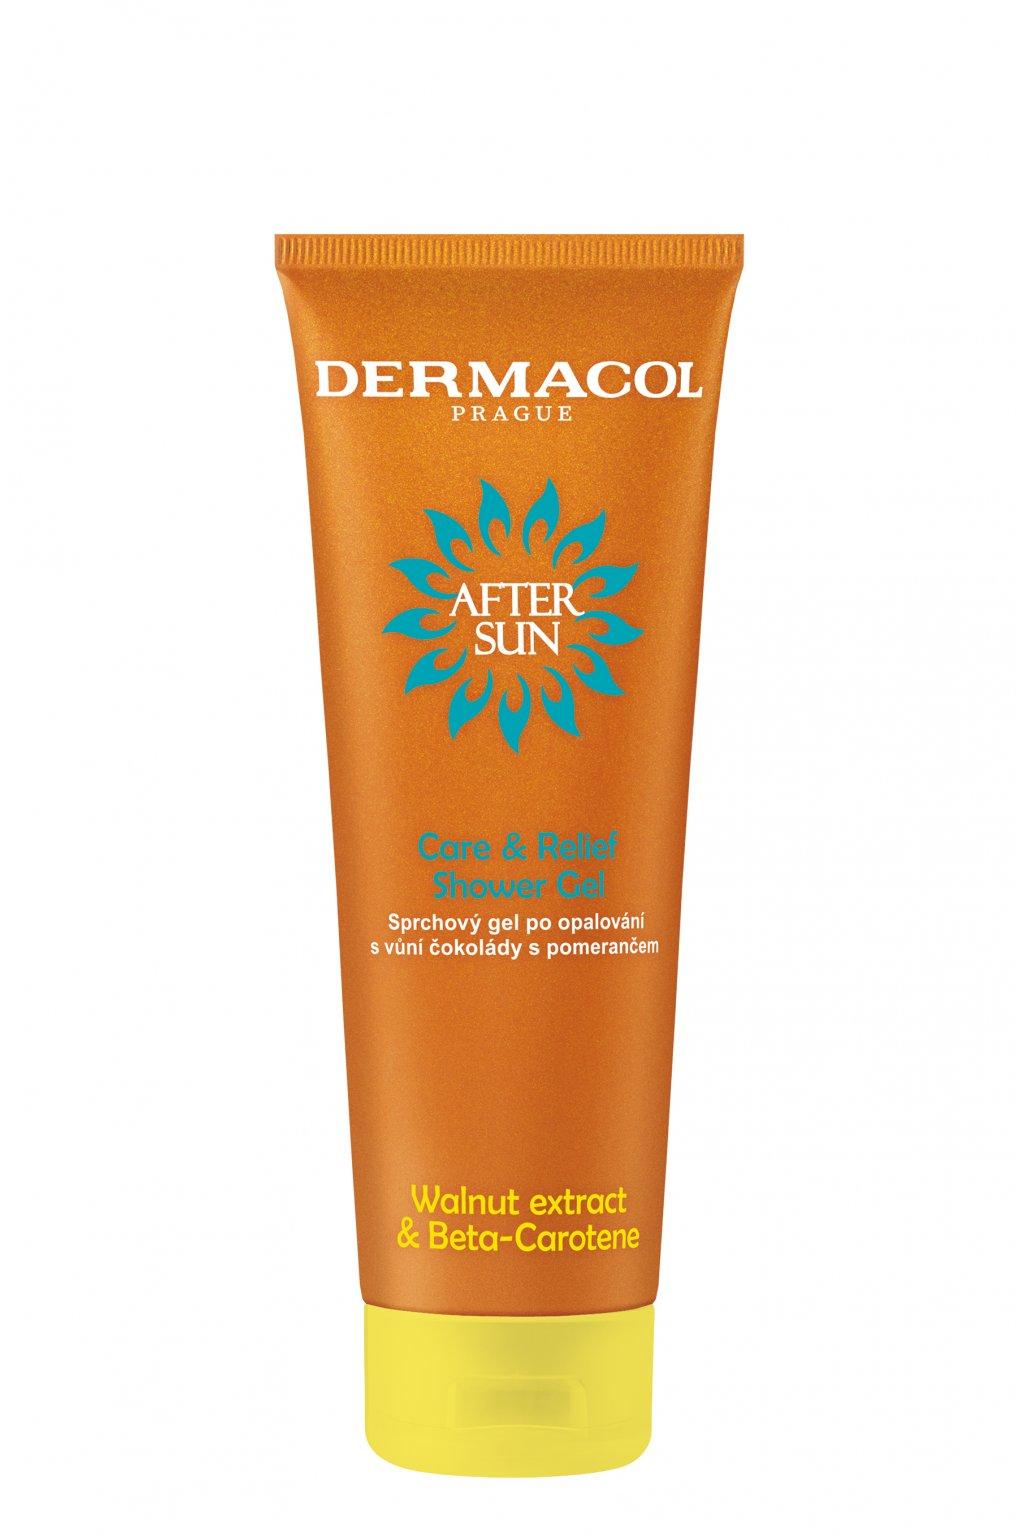 dermacol after sun sprchovy gel po opalovani